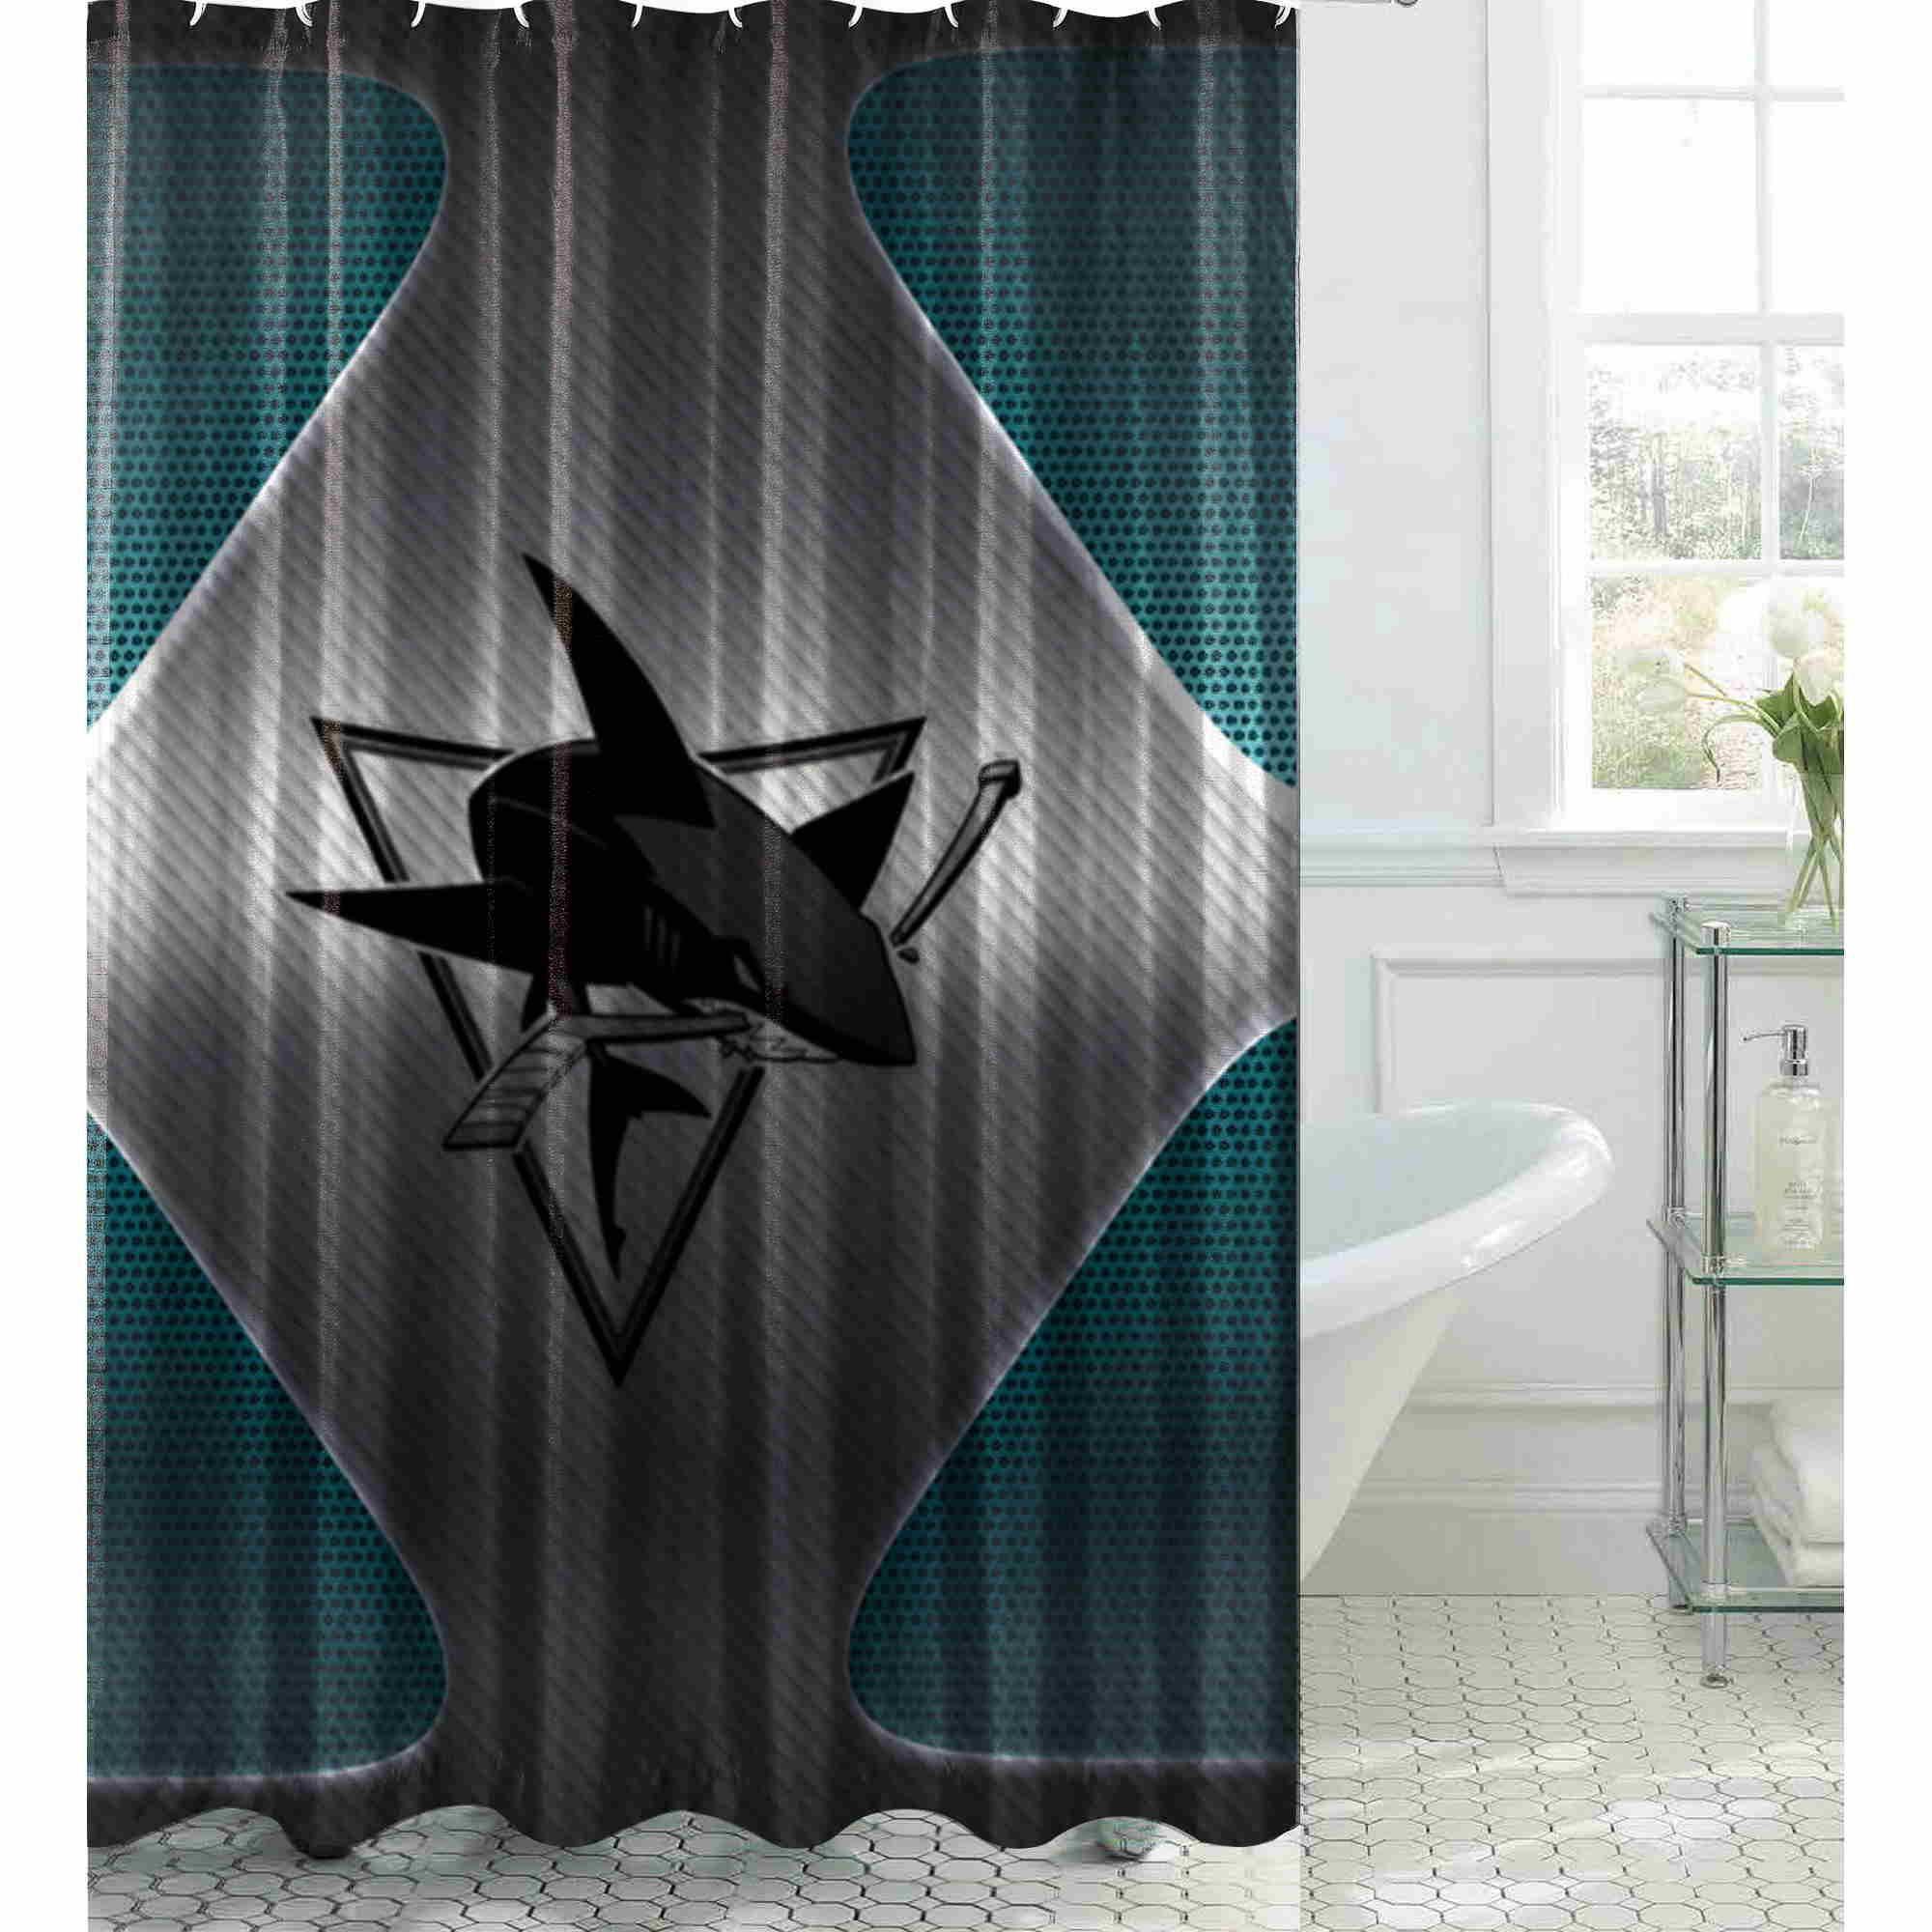 San Jose Sharks Nhl Hockey Team 2273 Bathroom Shower Curtain